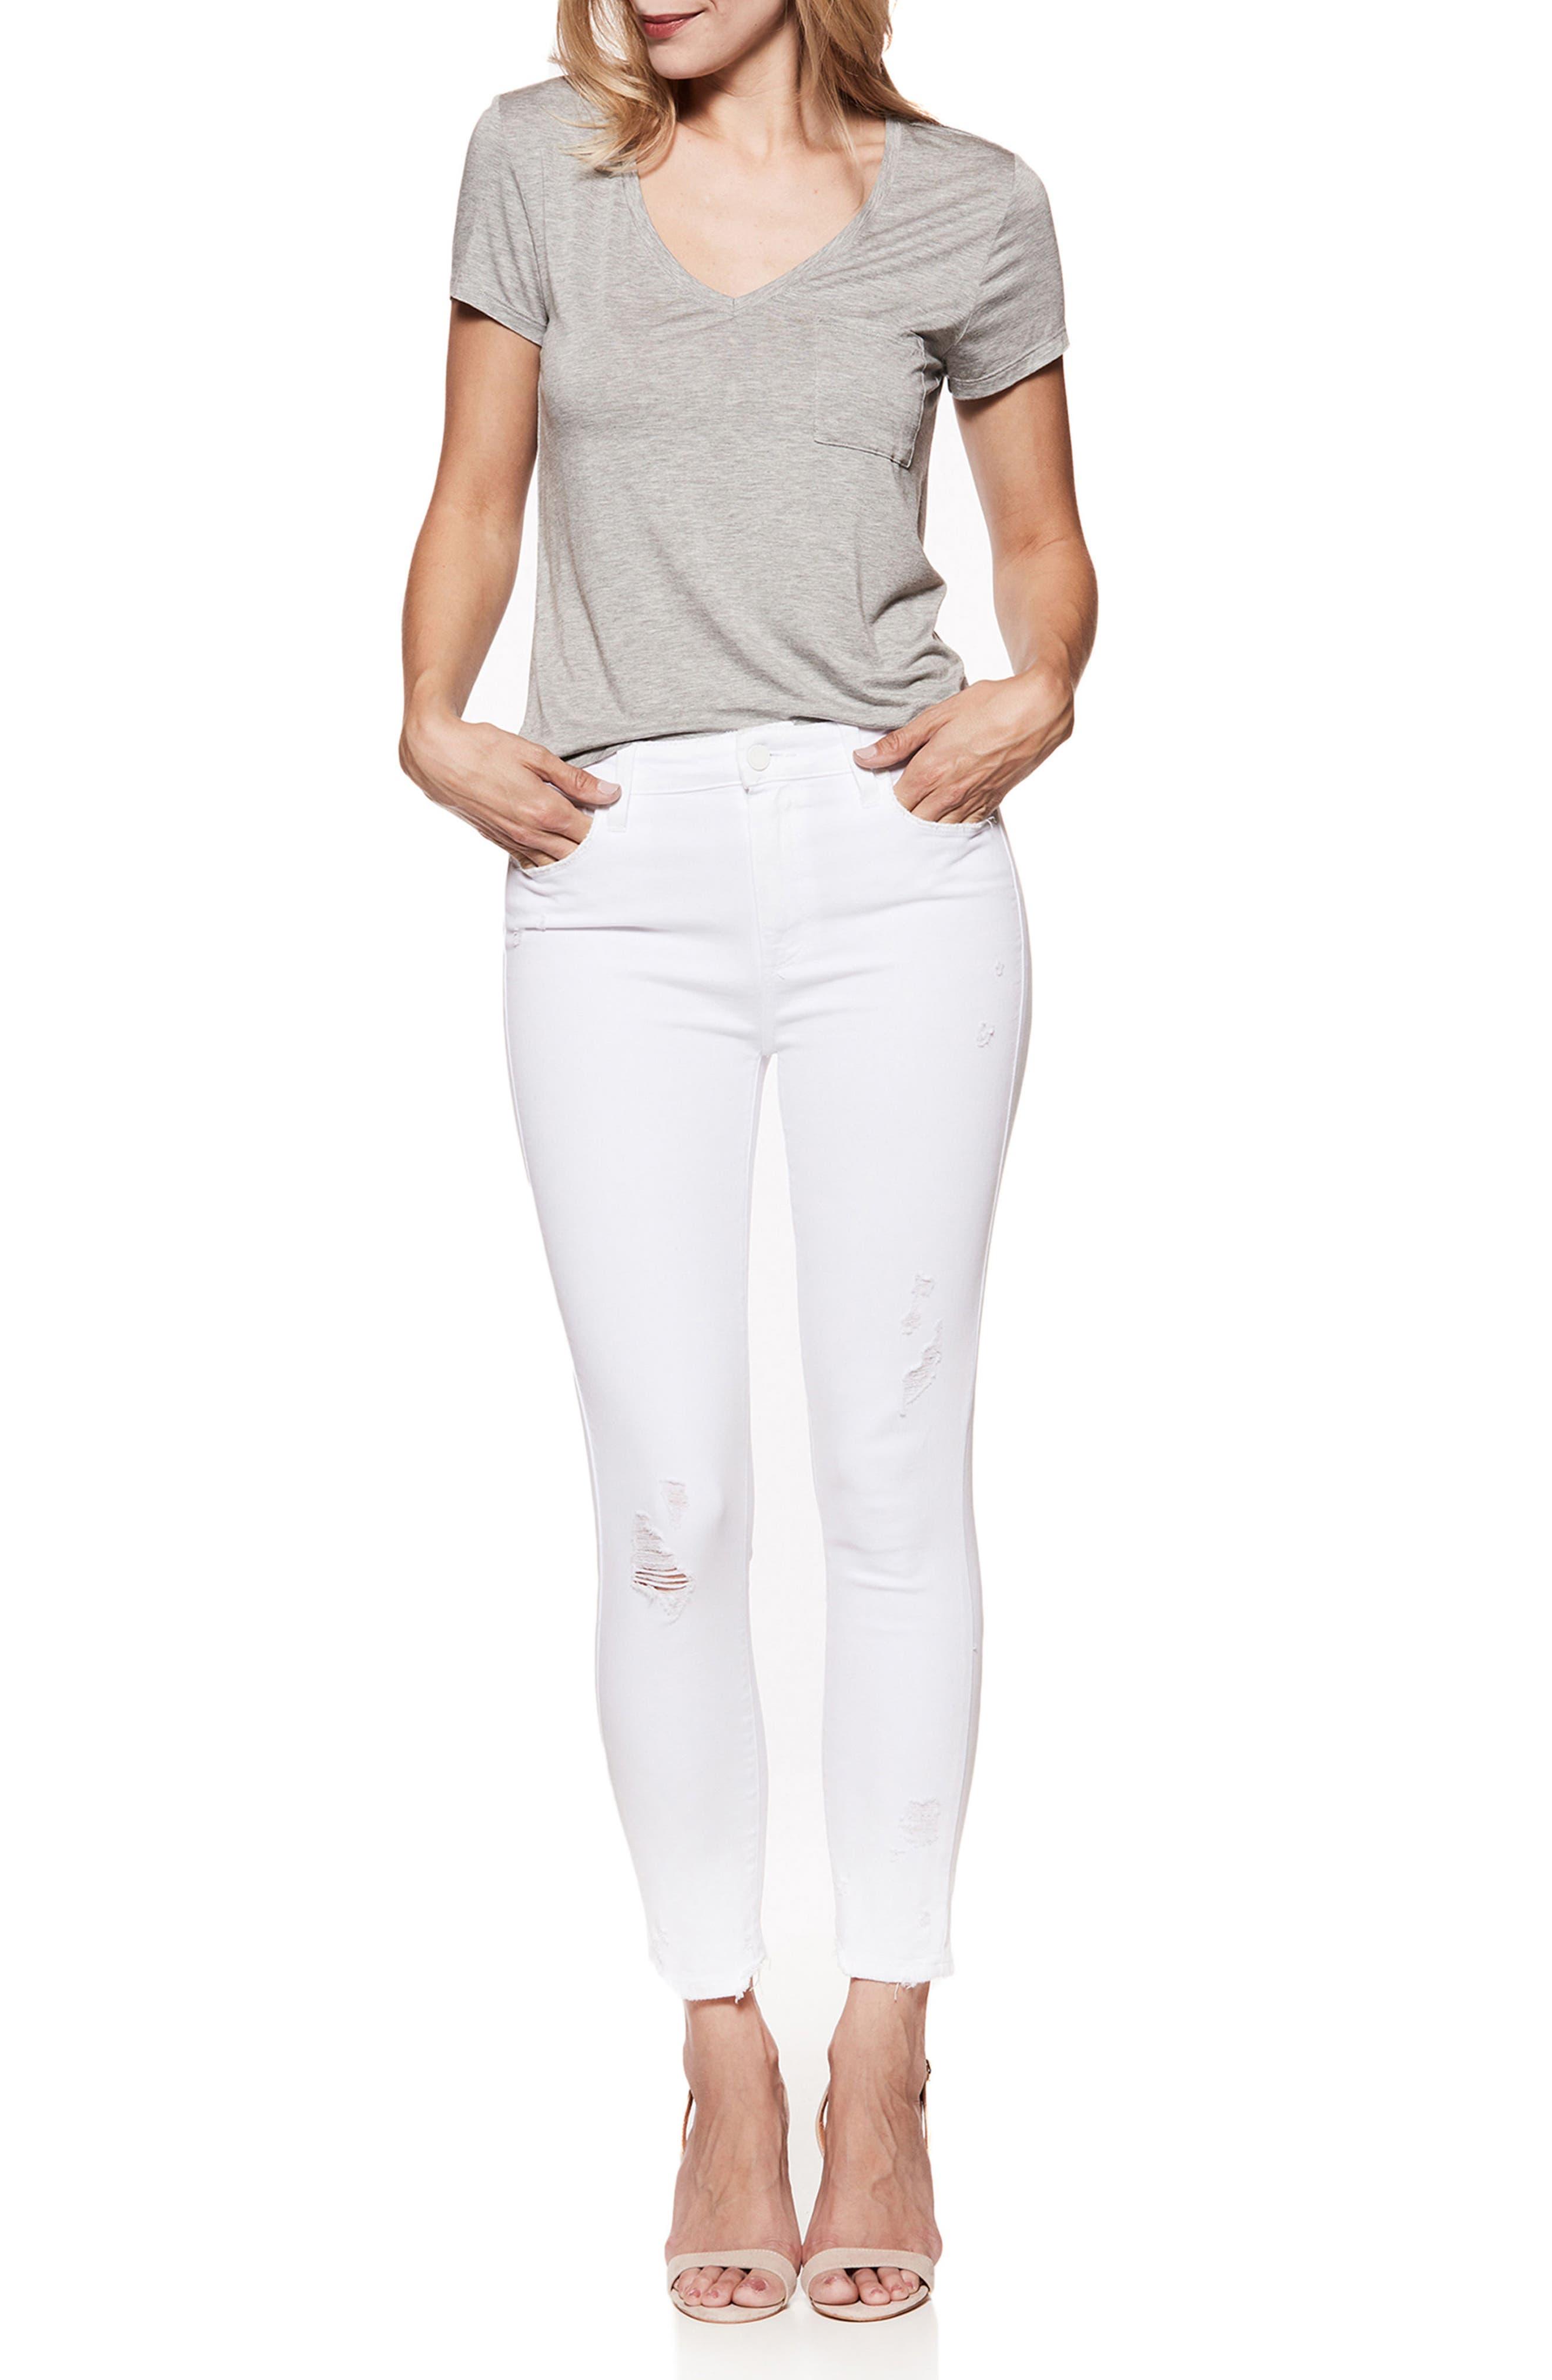 Hoxton High Waist Ankle Skinny Jeans,                             Alternate thumbnail 2, color,                             Crisp White Destructed